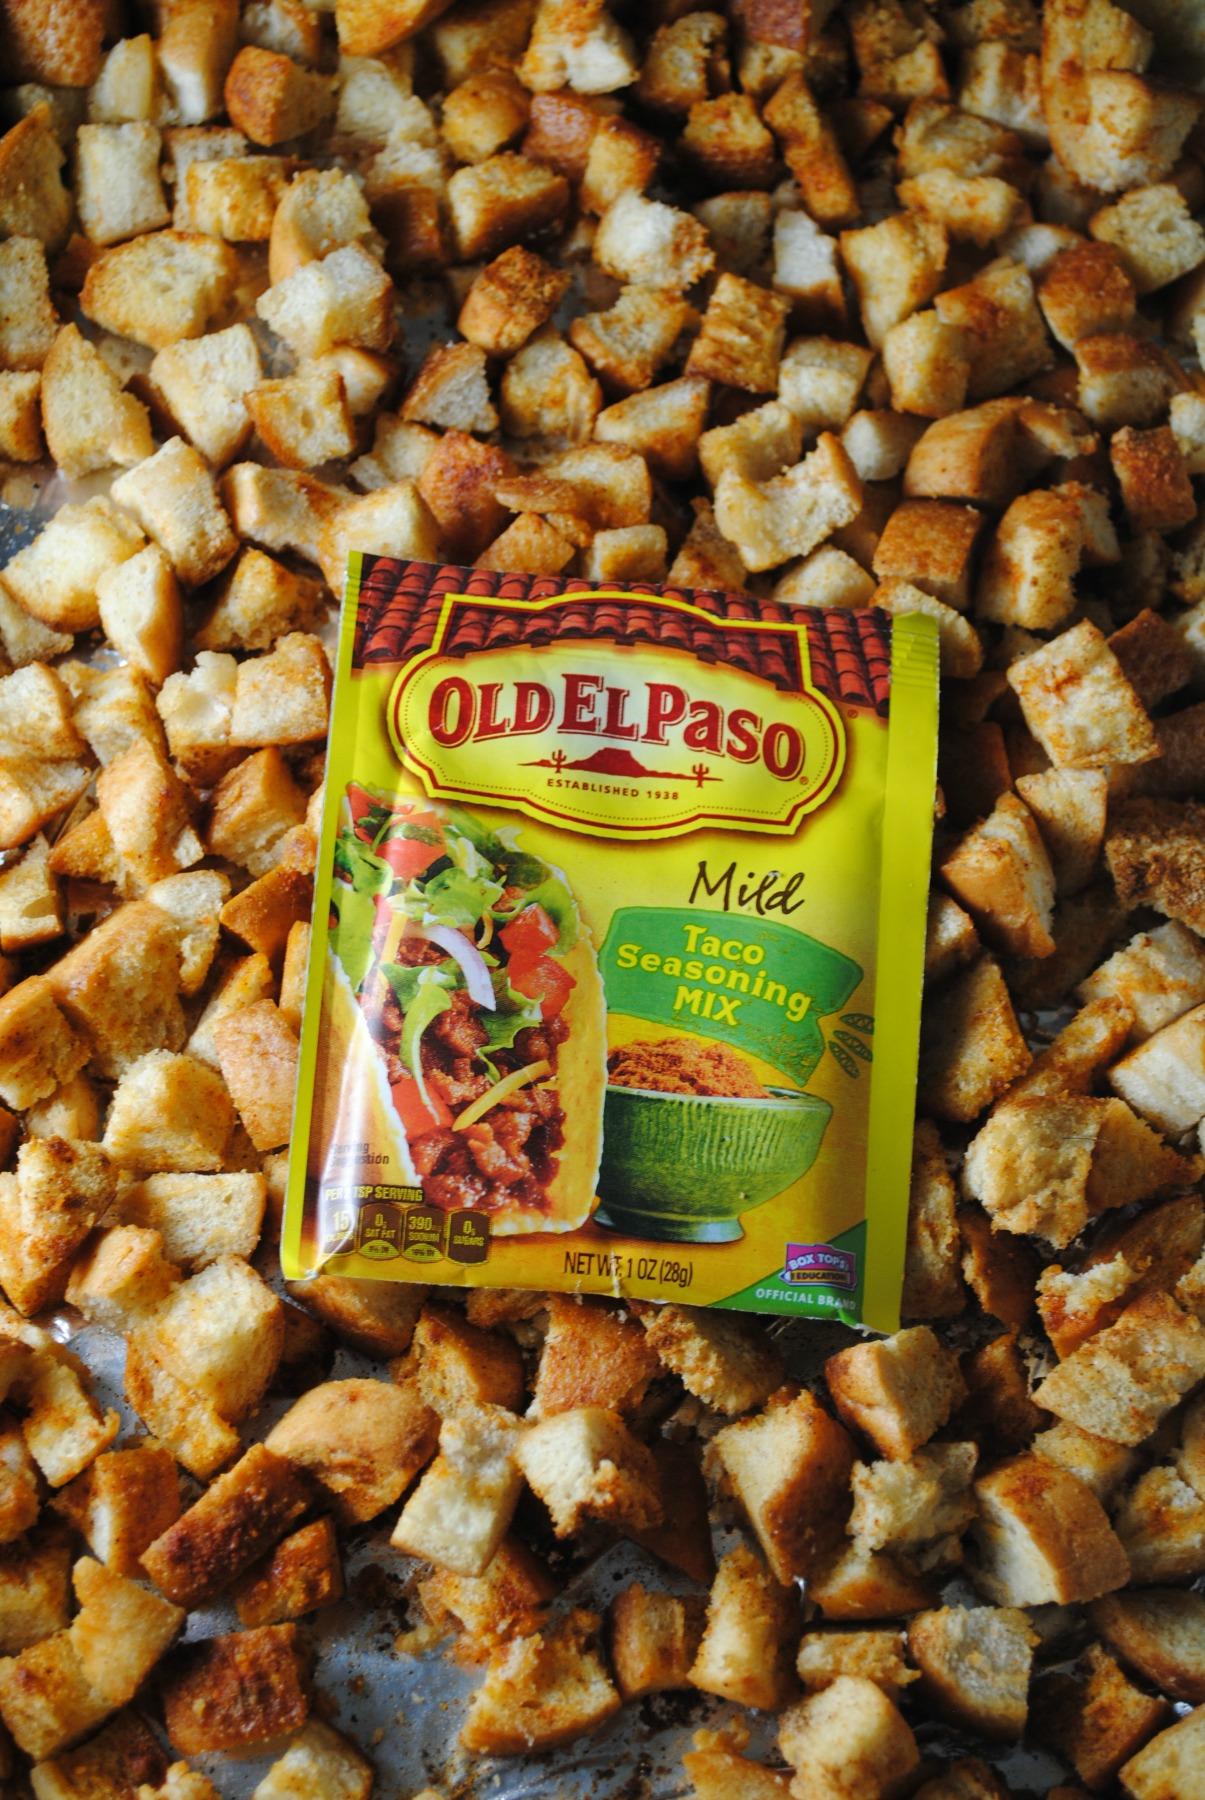 Tex-Mex-stuffing-VianneyRodriguez-oldelpaso-taco-seasoning